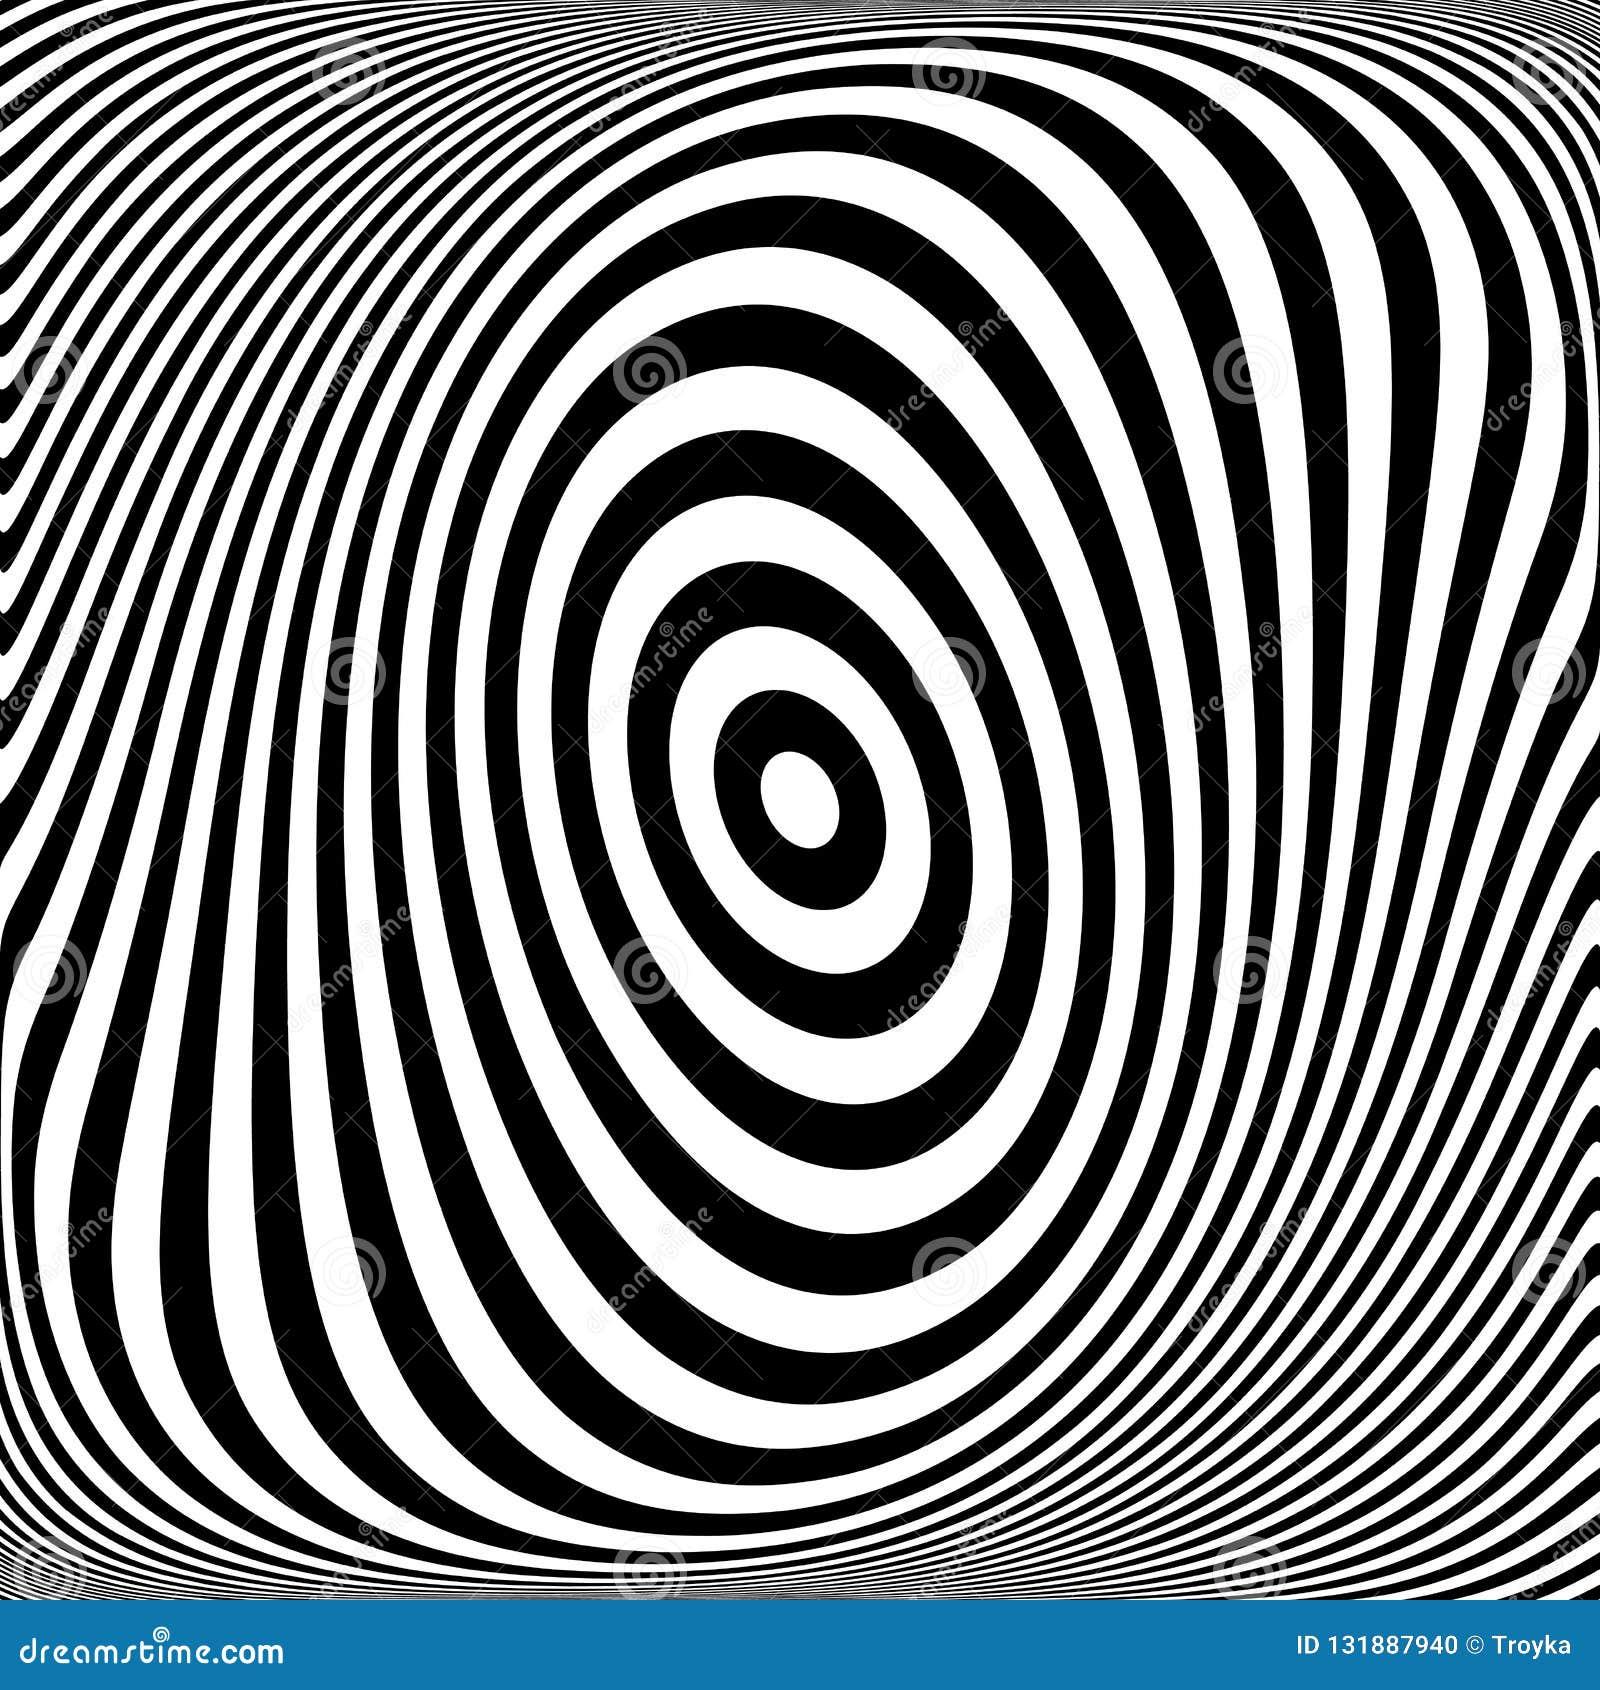 Rotation torsion movement illusion. Oval lines texture